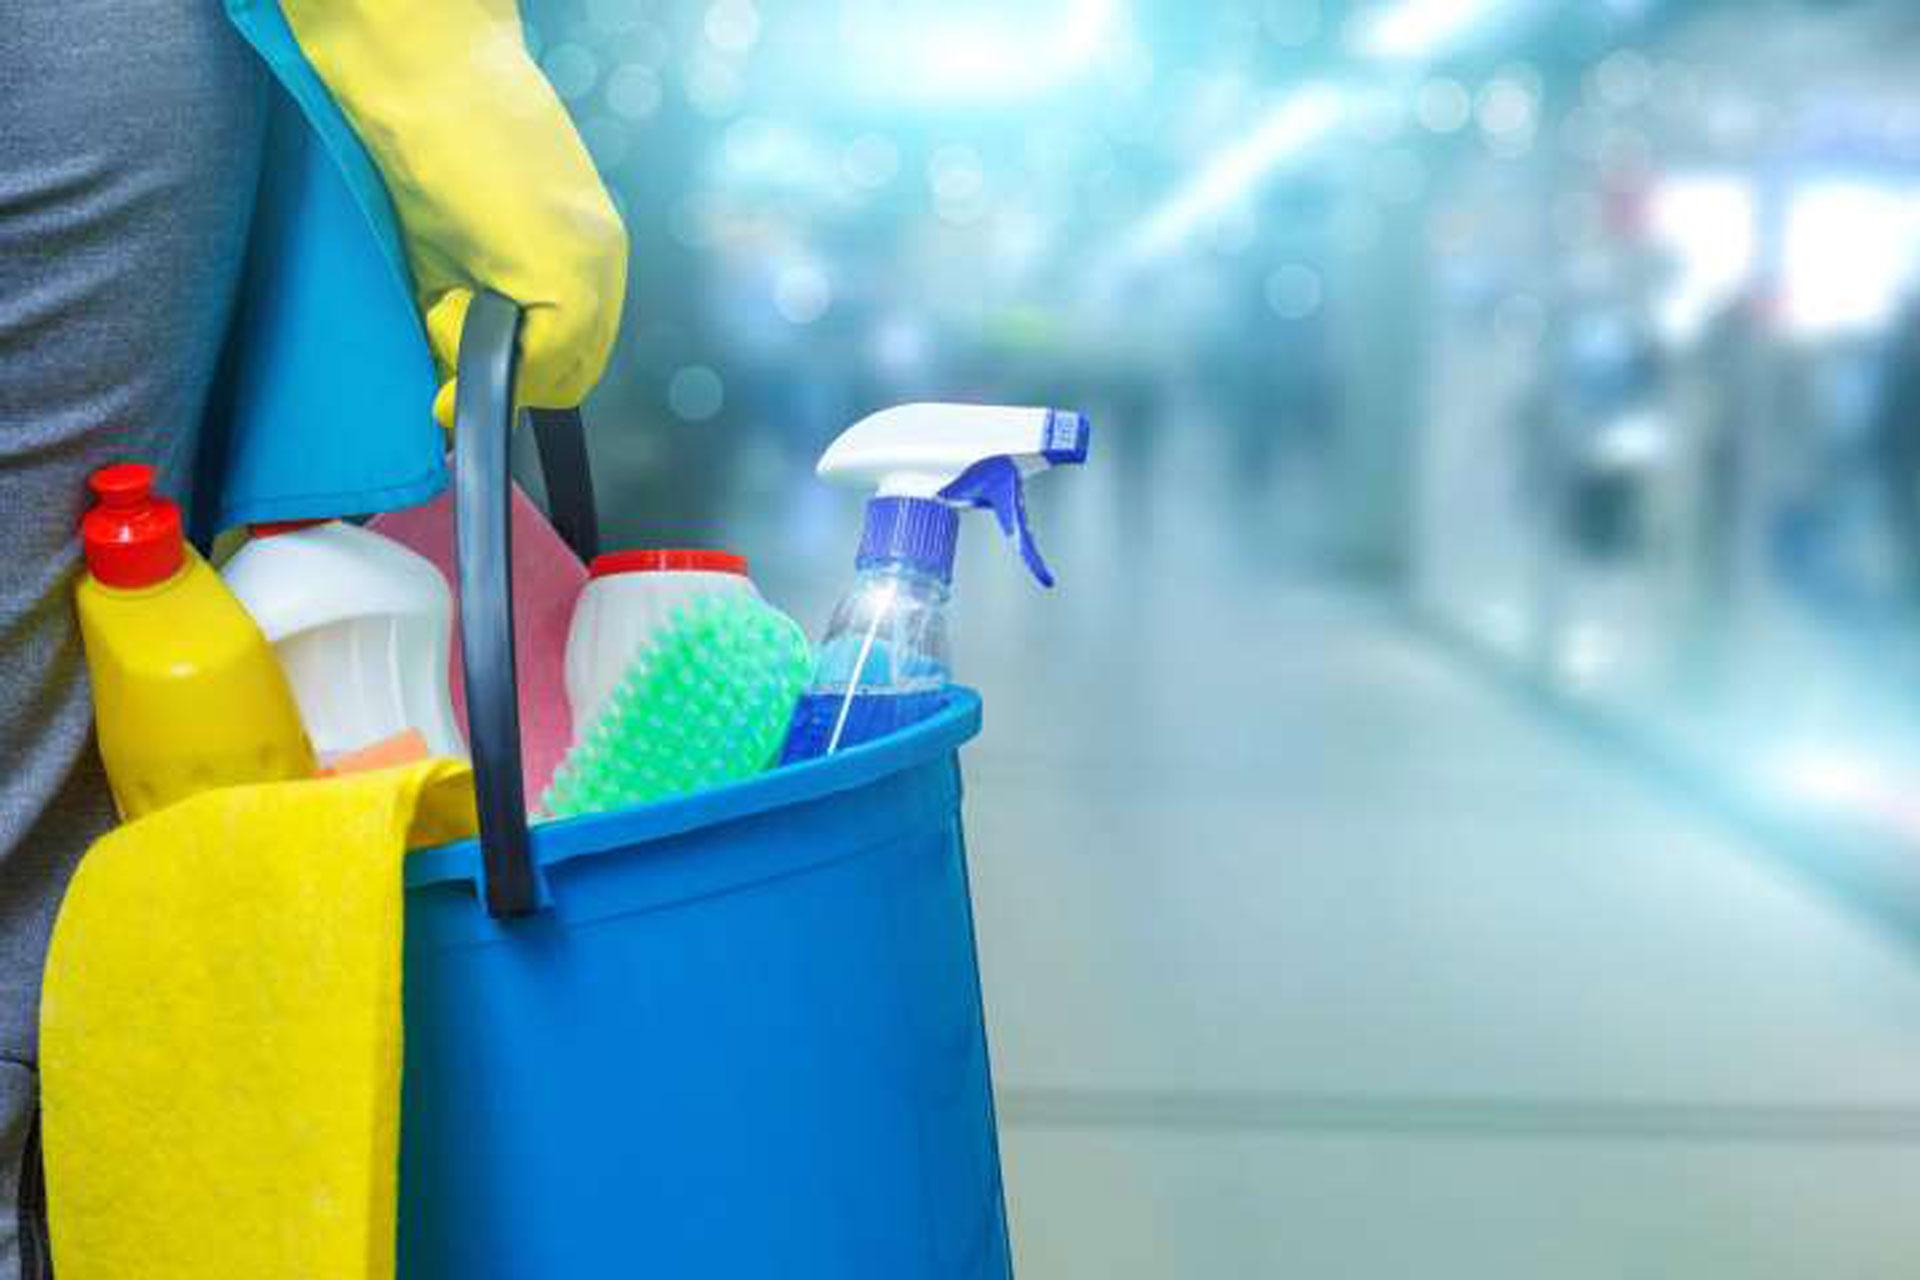 dezinfectia-generala-cu-tabletele-clorigene-quick-jav